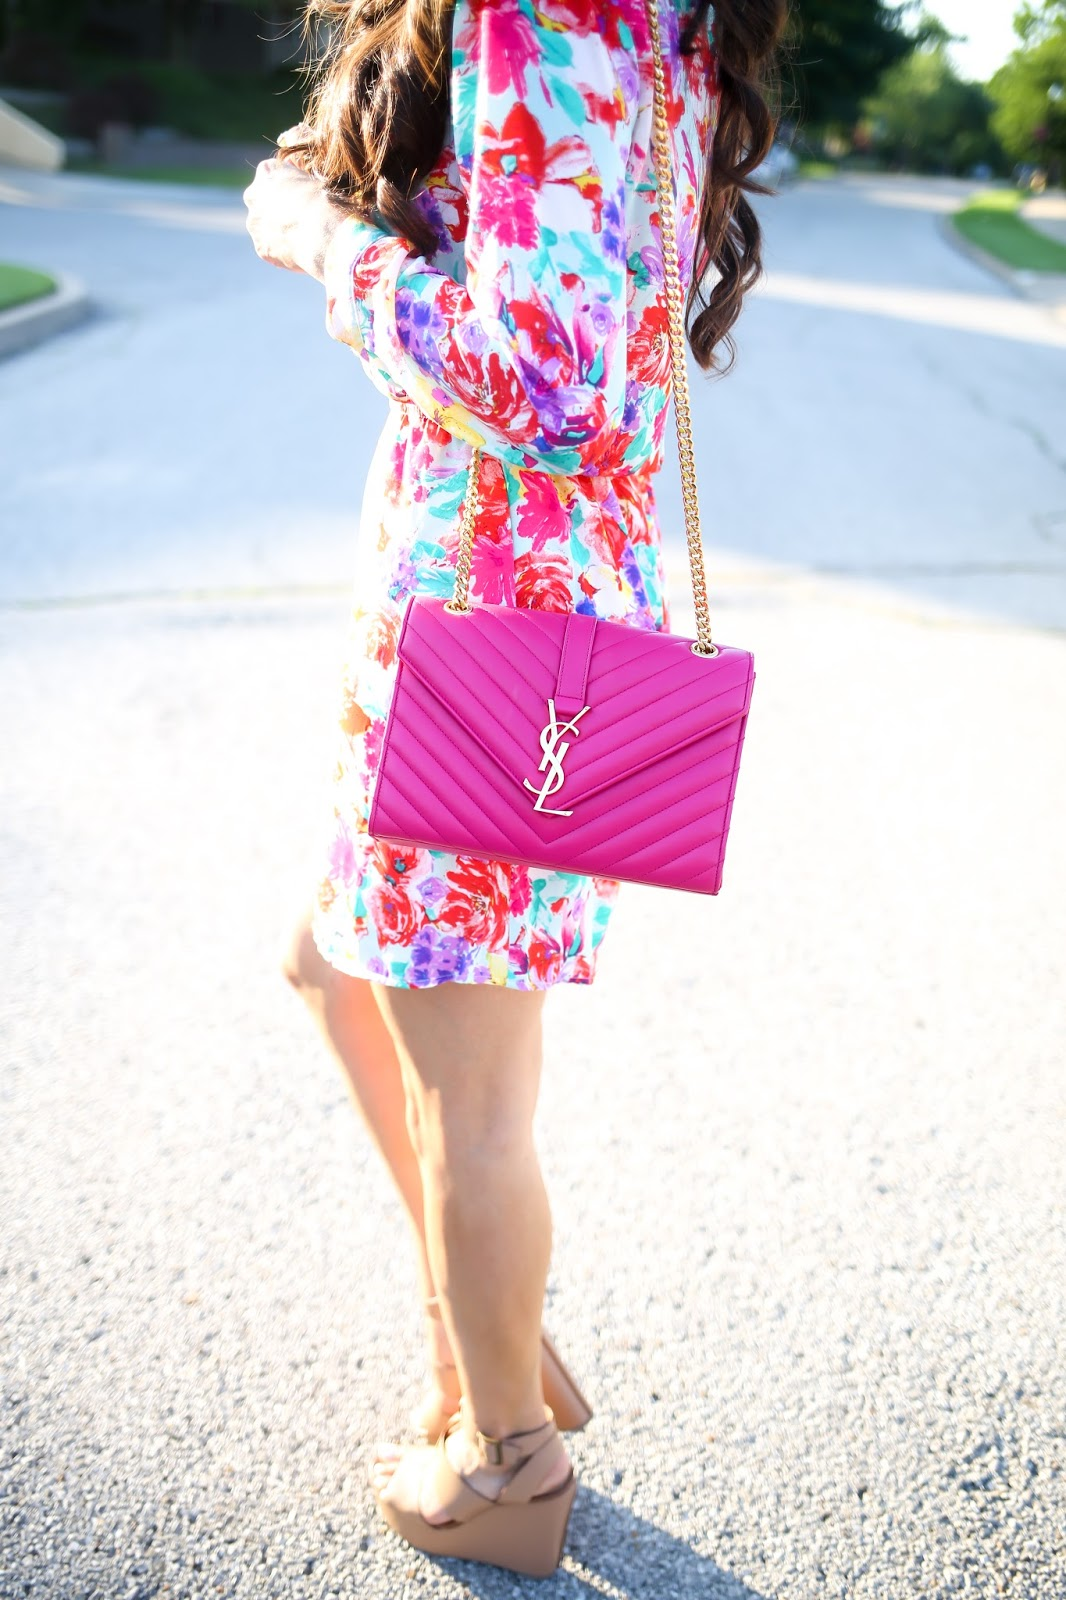 ysl handbag pink